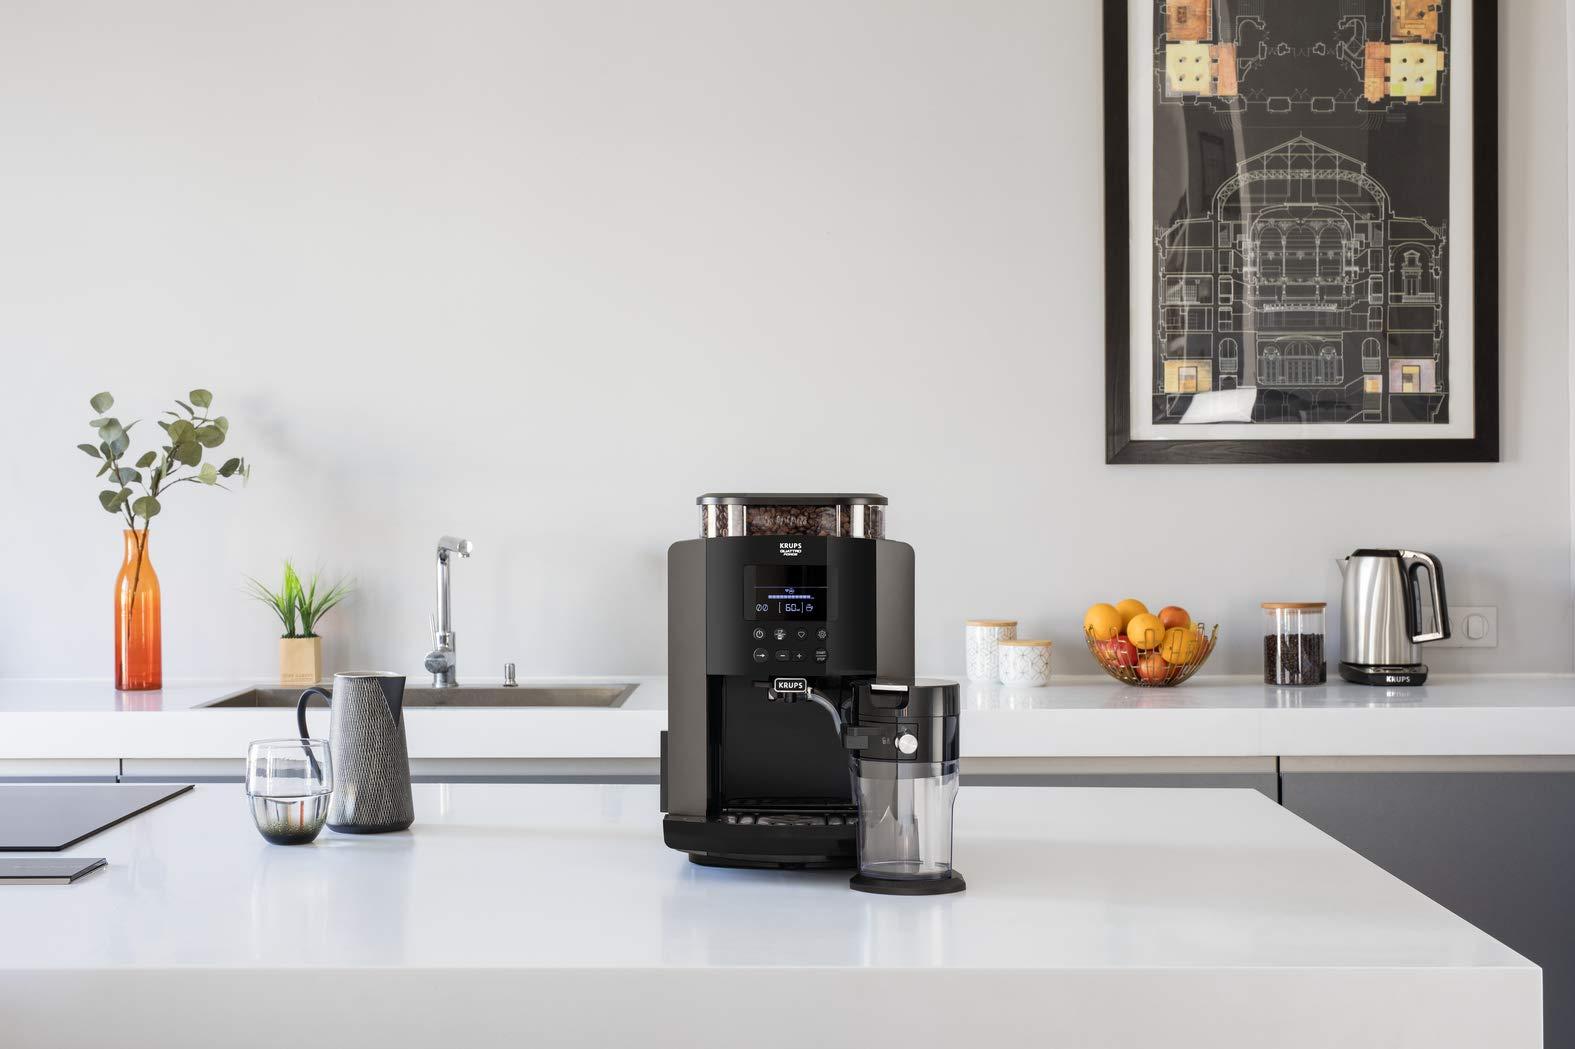 Krups-EA819E-Arabica-Latte-Quattro-Force-Kaffeevollautomat-1450-Watt-Wassertankkapazitt-17-Liter-Pumpendruck-15-bar-LCD-Display-Platin-schwarz